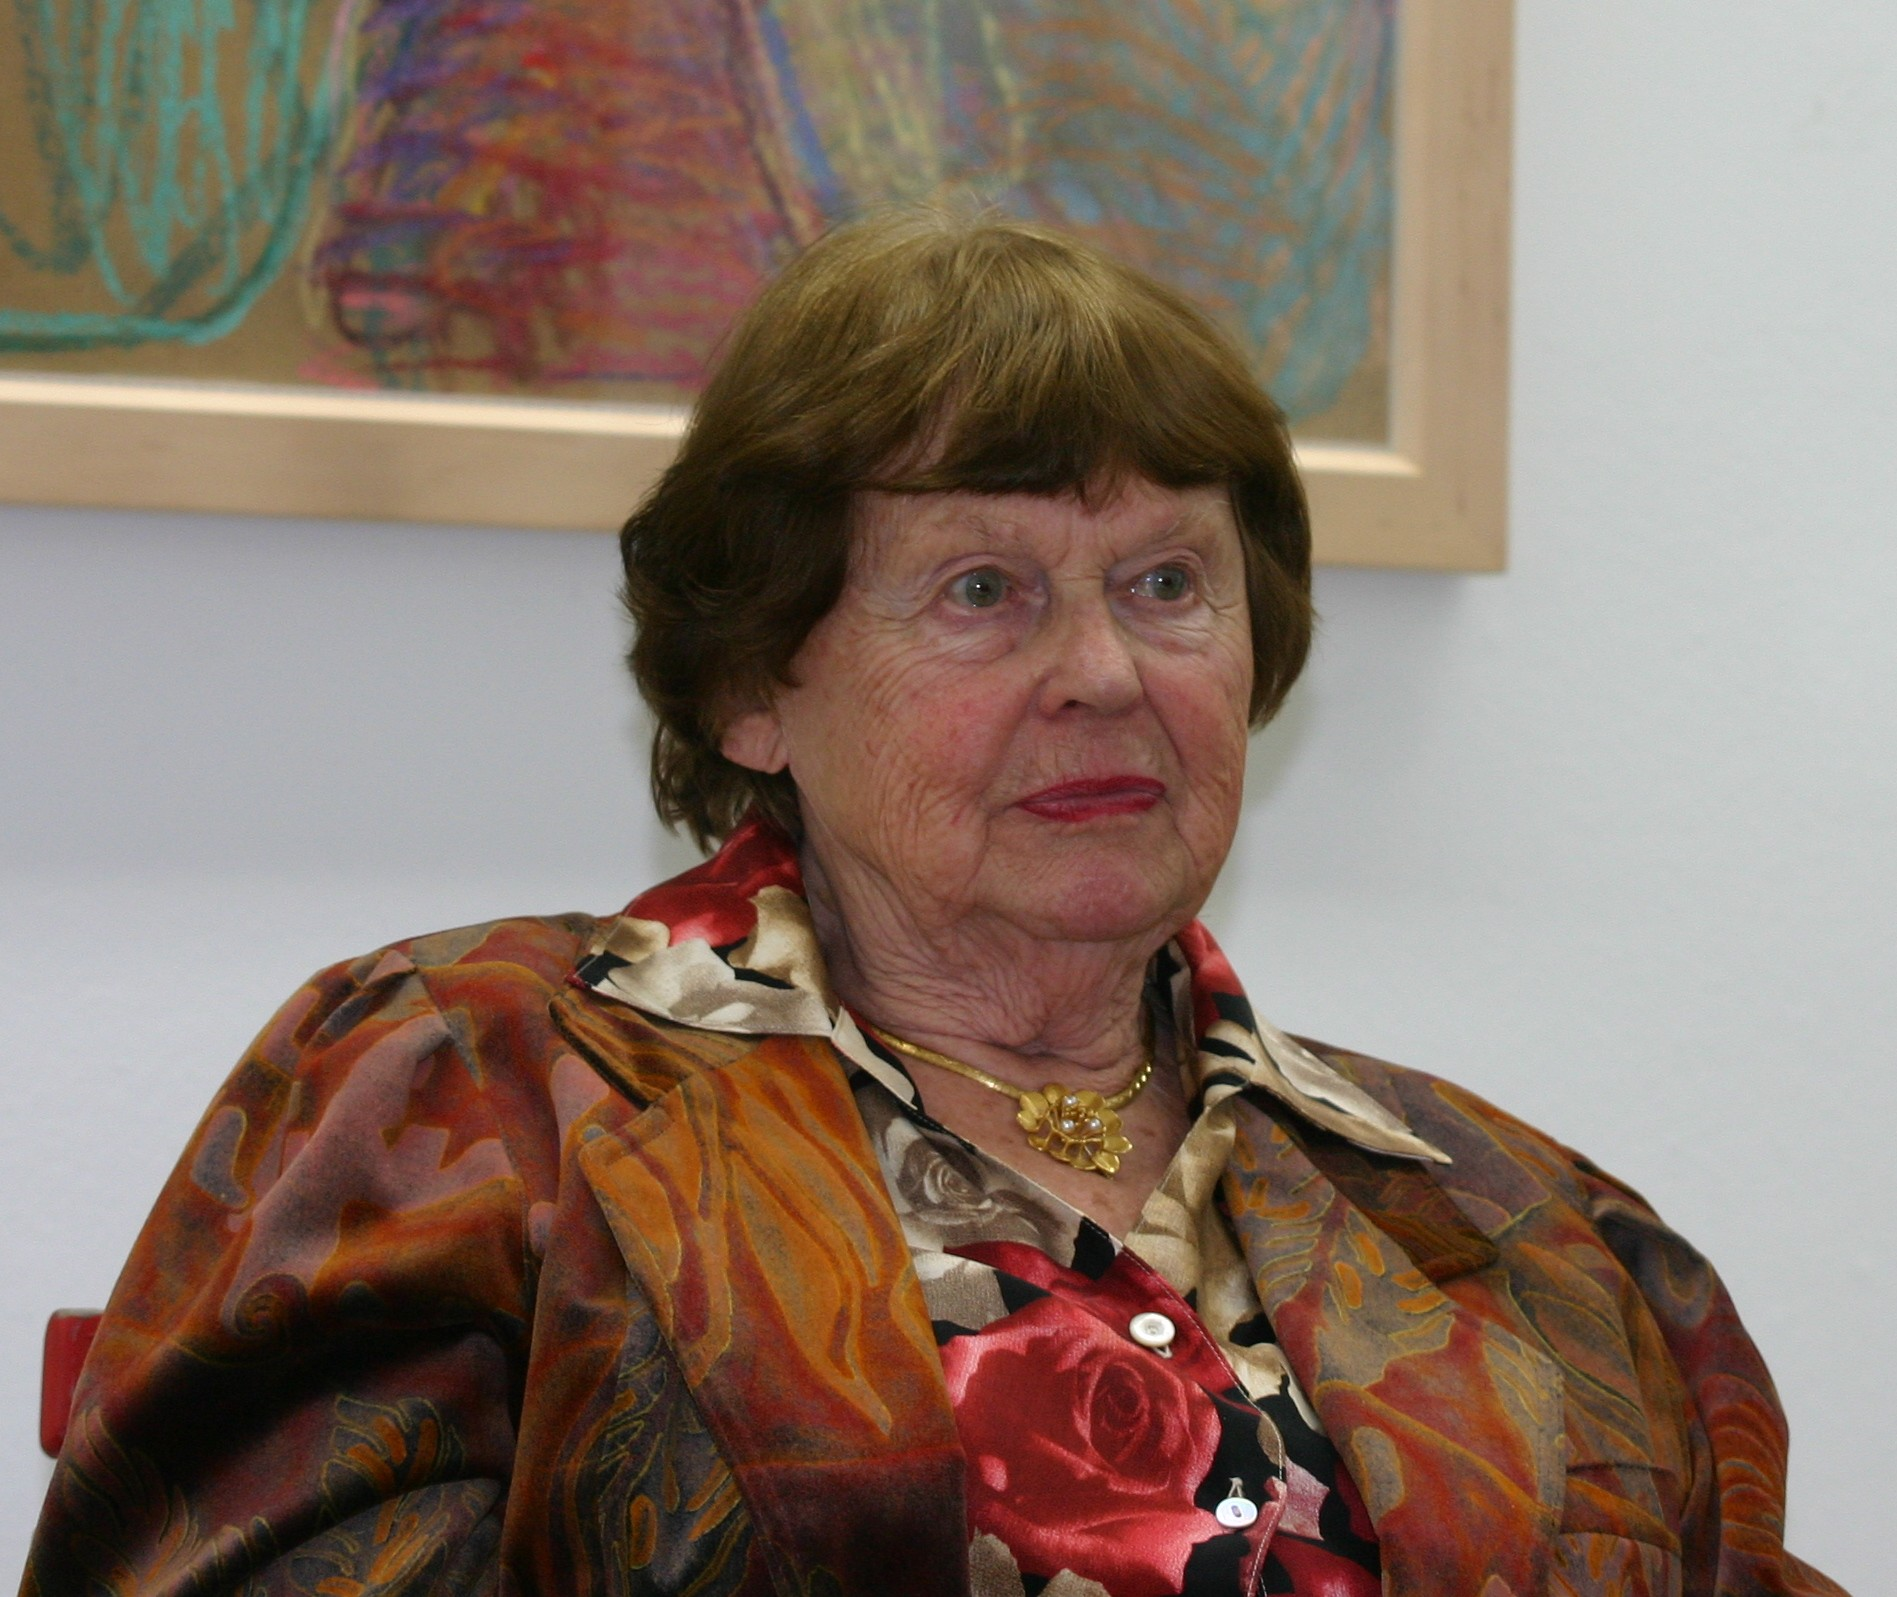 Laura Mennell,Chloe Hunter Adult gallery Lyca Gairanod (b. 2004),Anthony Steel (1920?001)